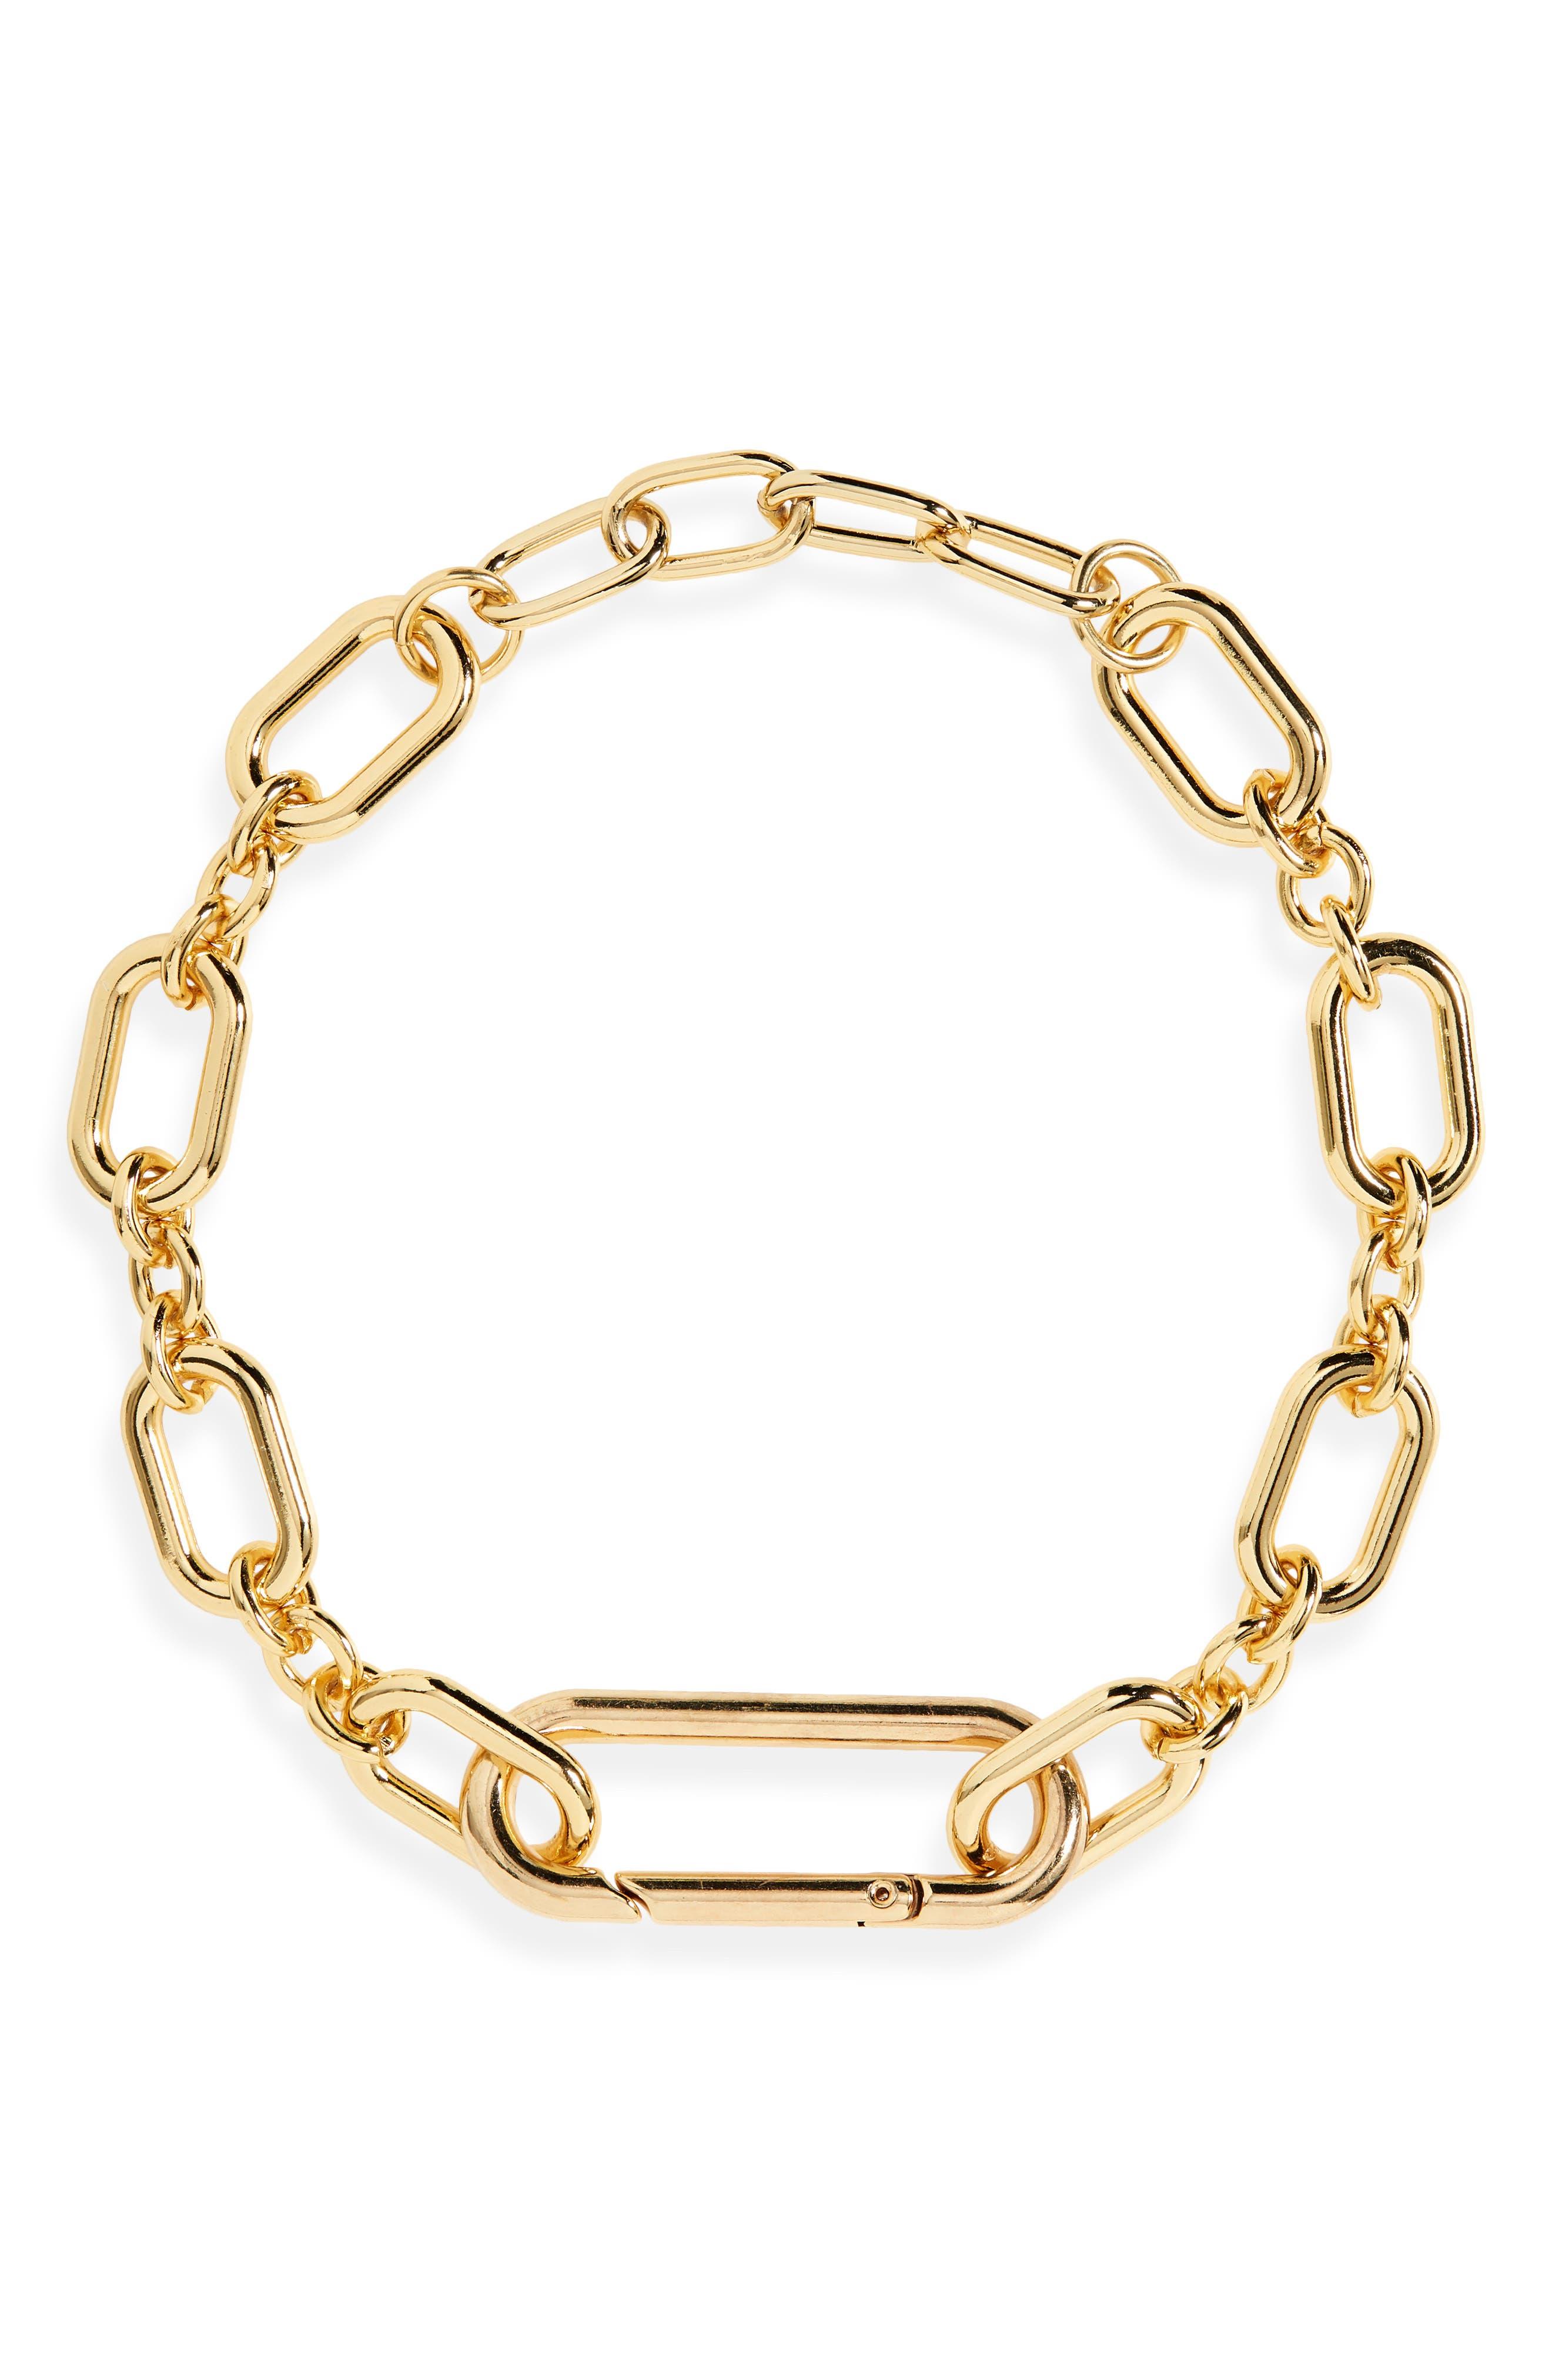 Women's Eliou Sai Chain Necklace